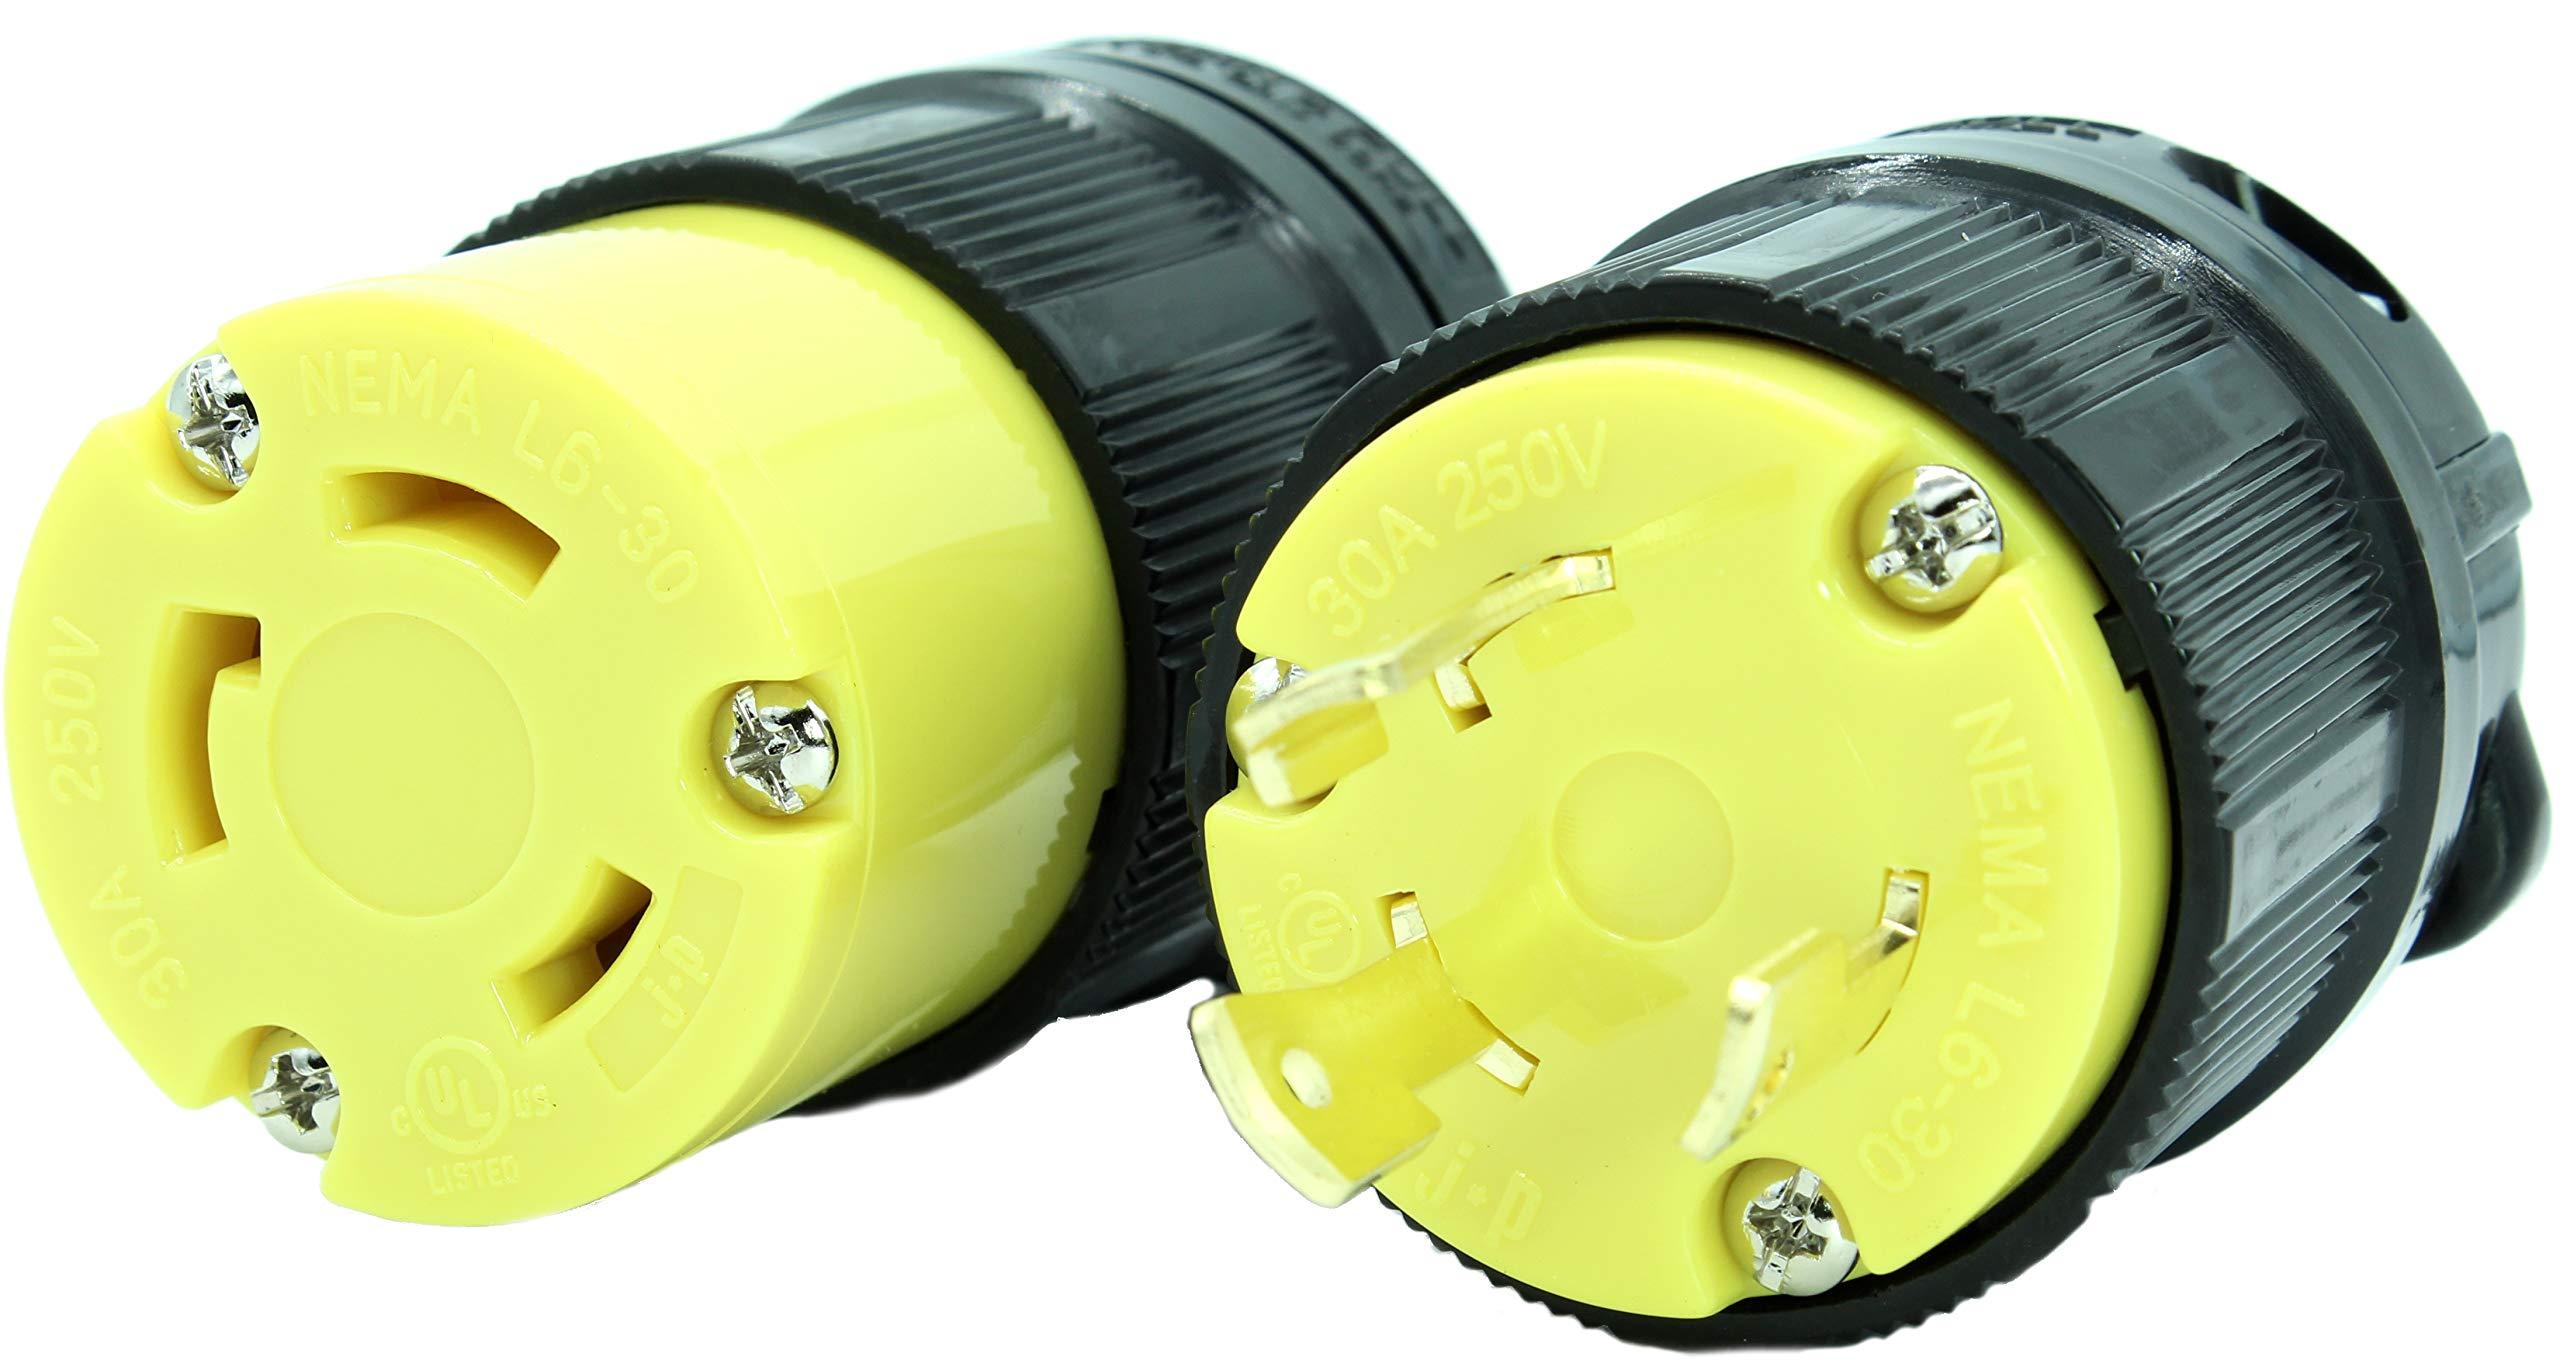 Journeyman-Pro NEMA L6-20 Plug & Connector Set, NEMA L6-20R & L6-20P, 20A, 250V, Locking Plug Socket, Black Industrial Grade, Grounding 5000 Watts Generators (L6-20PR Plug Set)